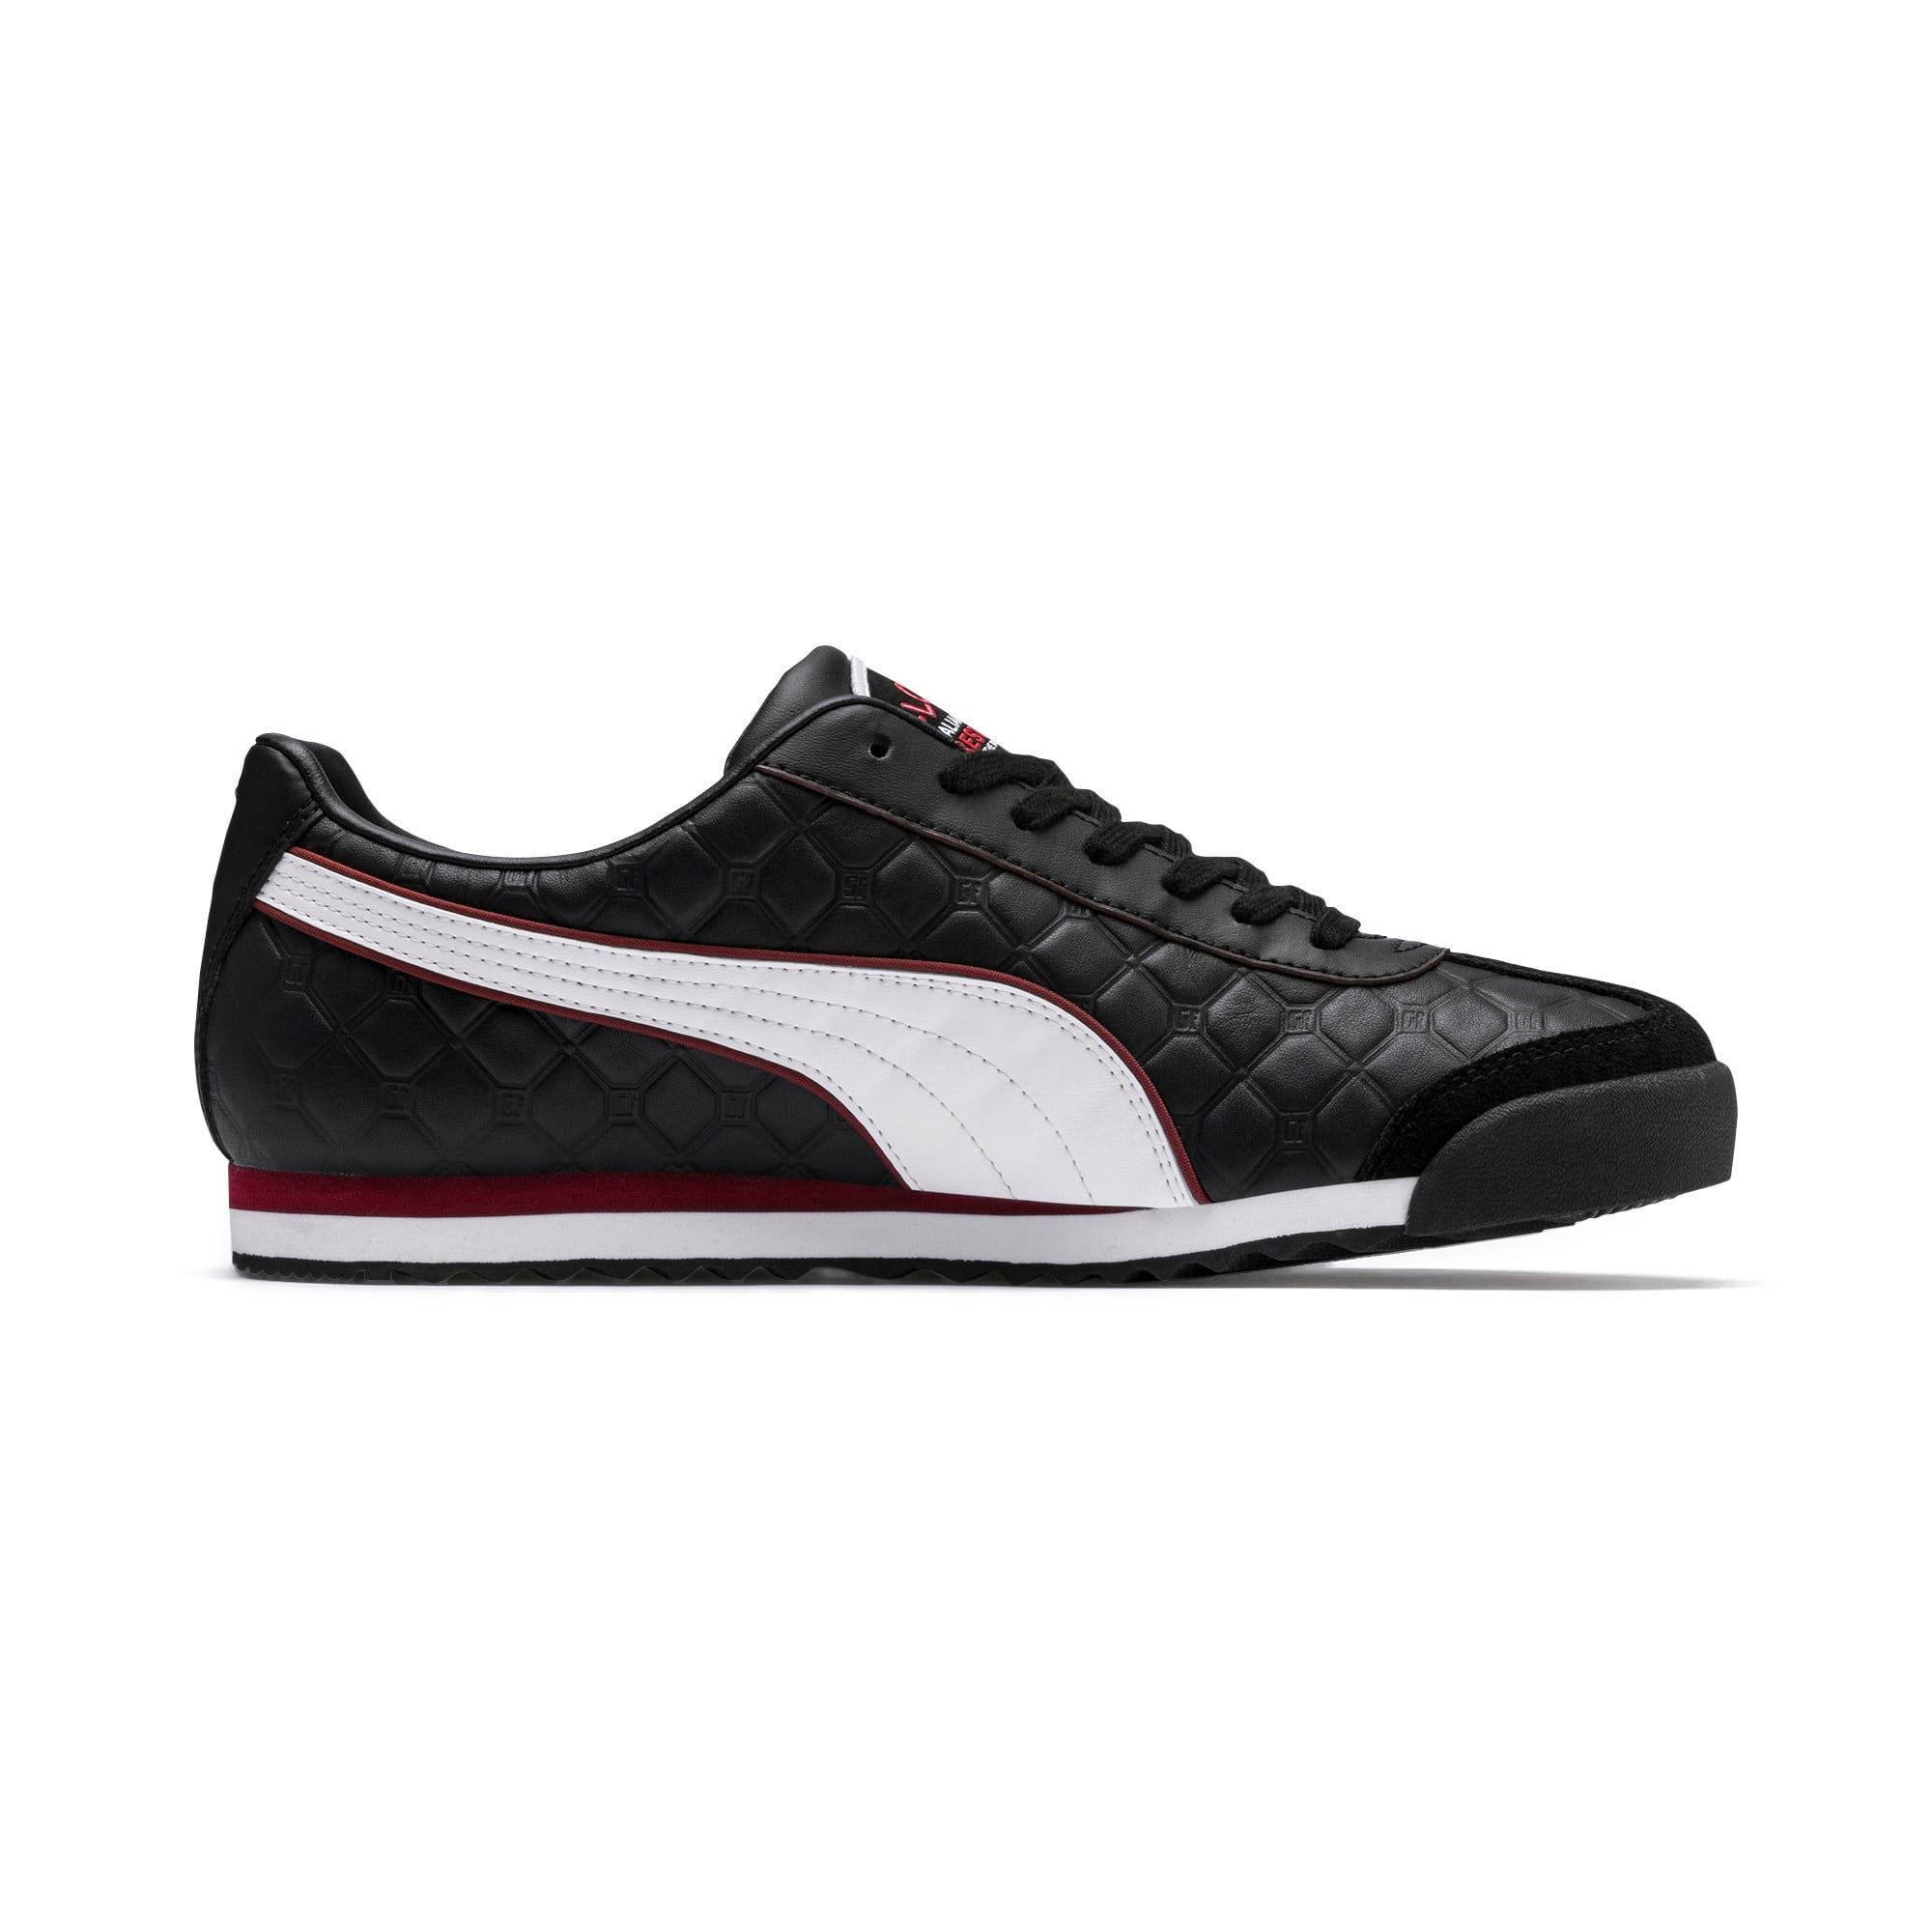 Miniatura 5 de Zapatos deportivos PUMA x THE GODFATHER Roma Louis, Puma Black-Fired Brick, mediano